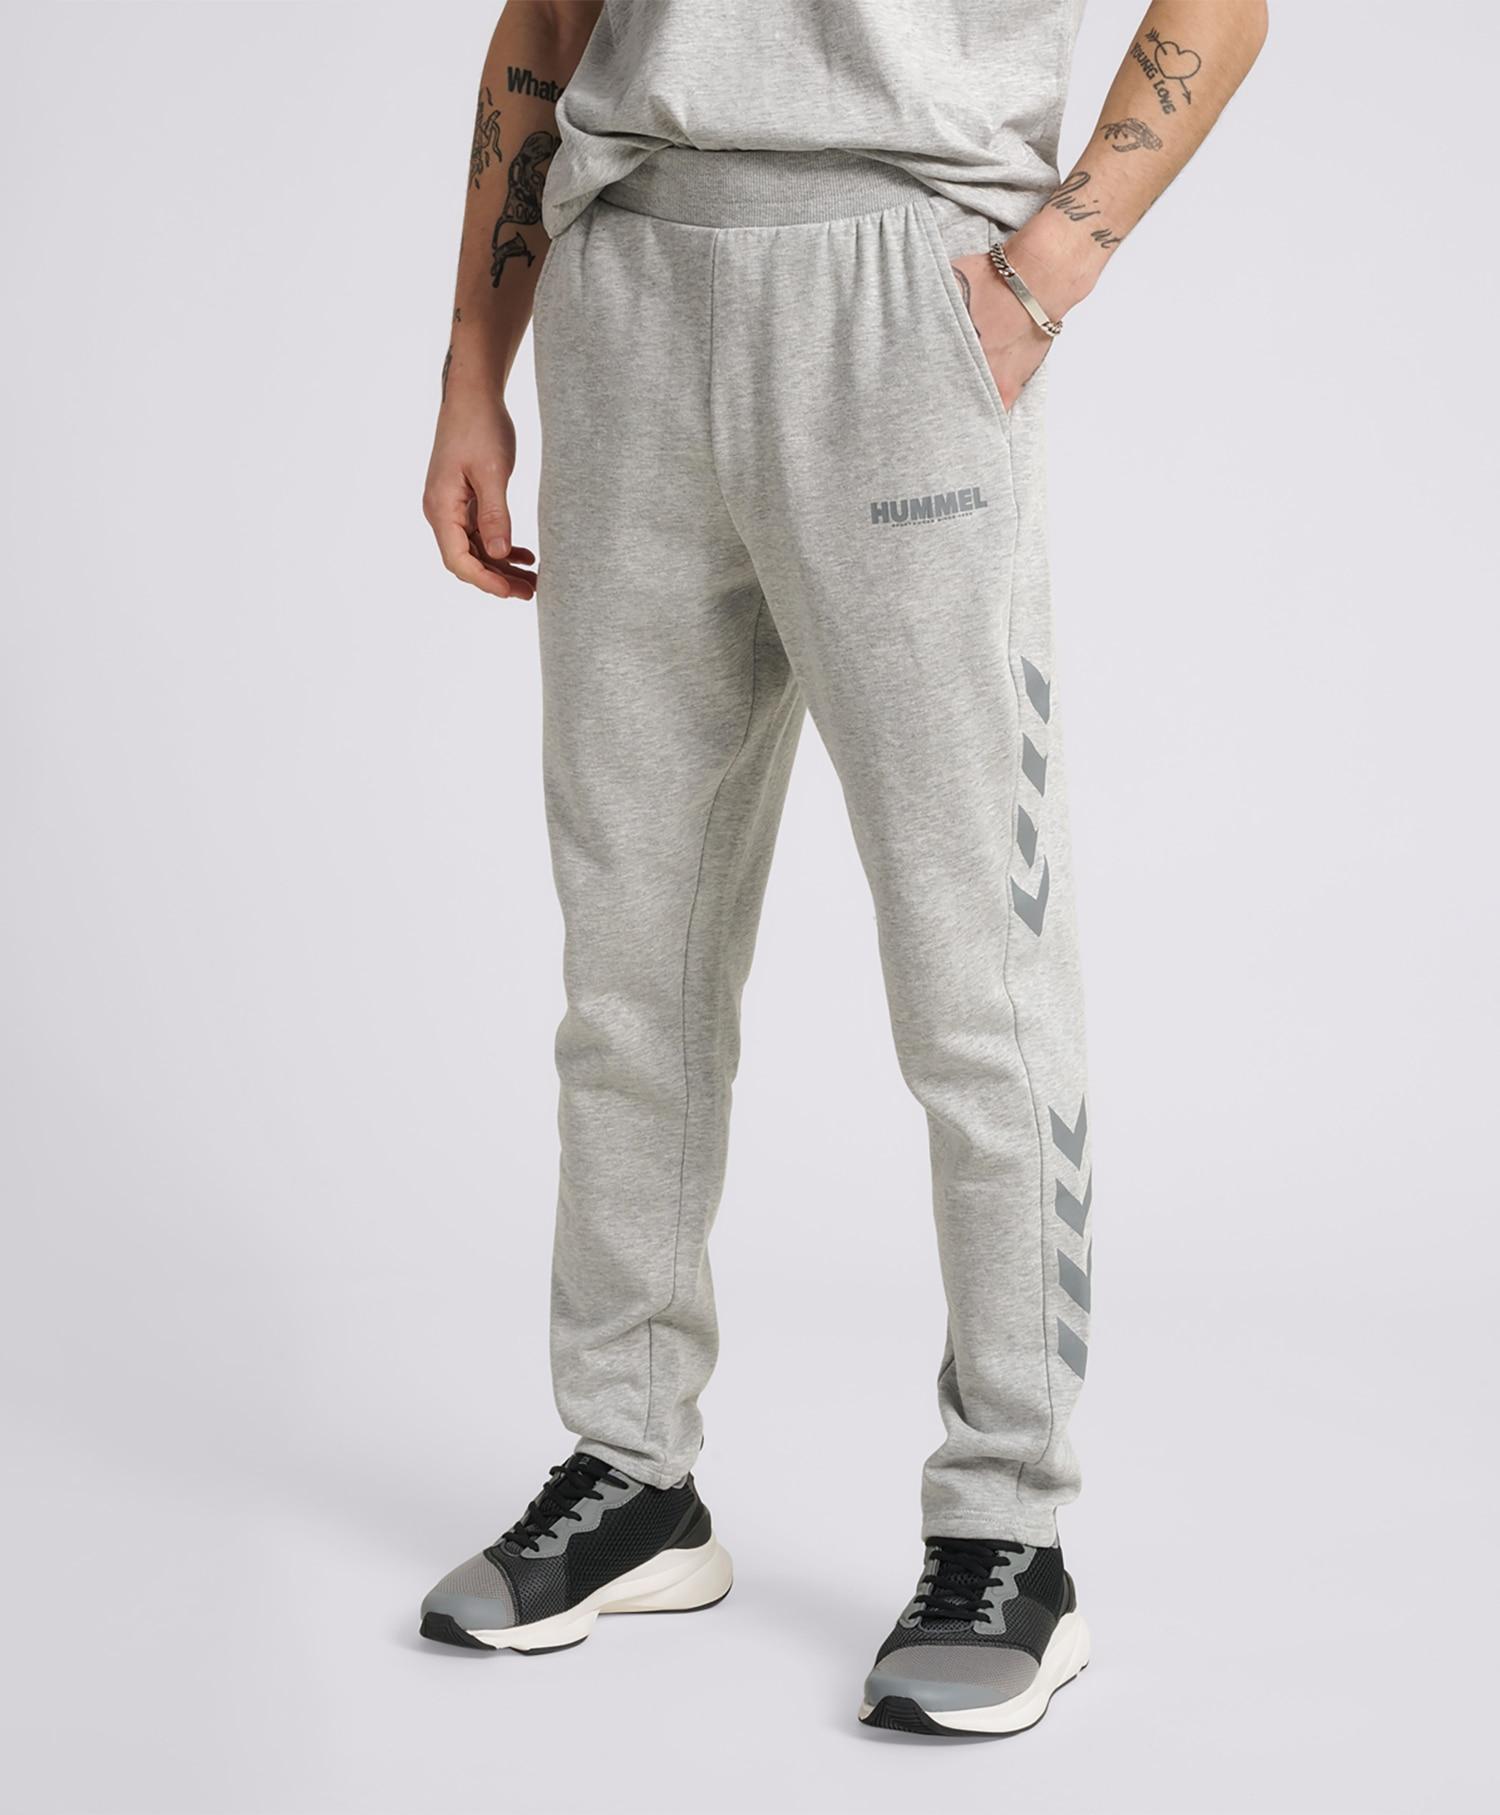 Hummel Leagacy Tapered Pants